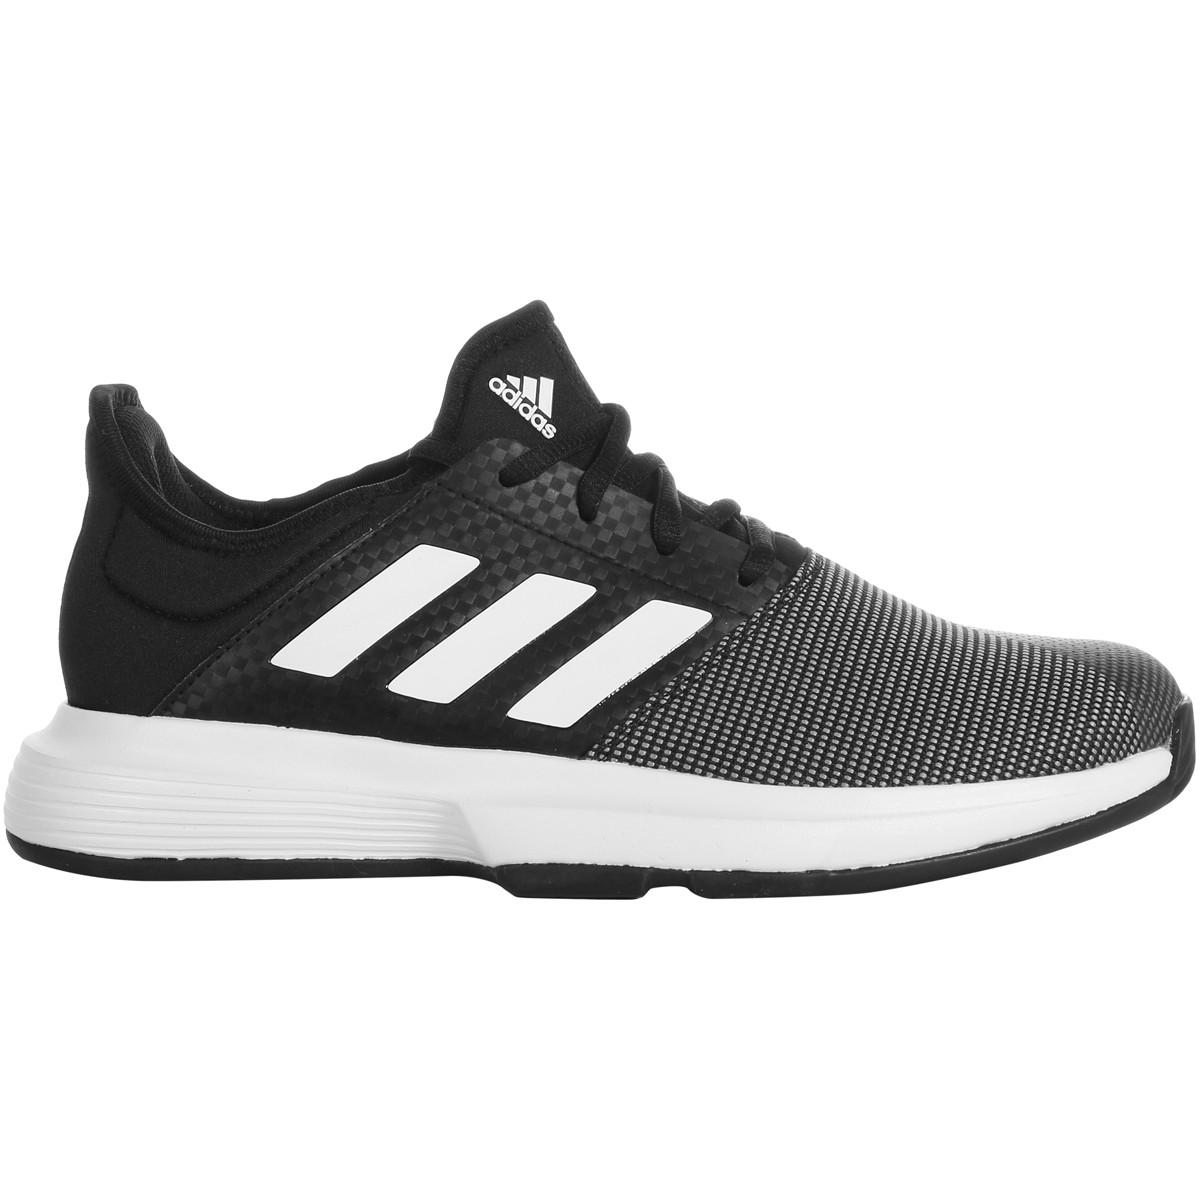 chaussures tennis adidas femme